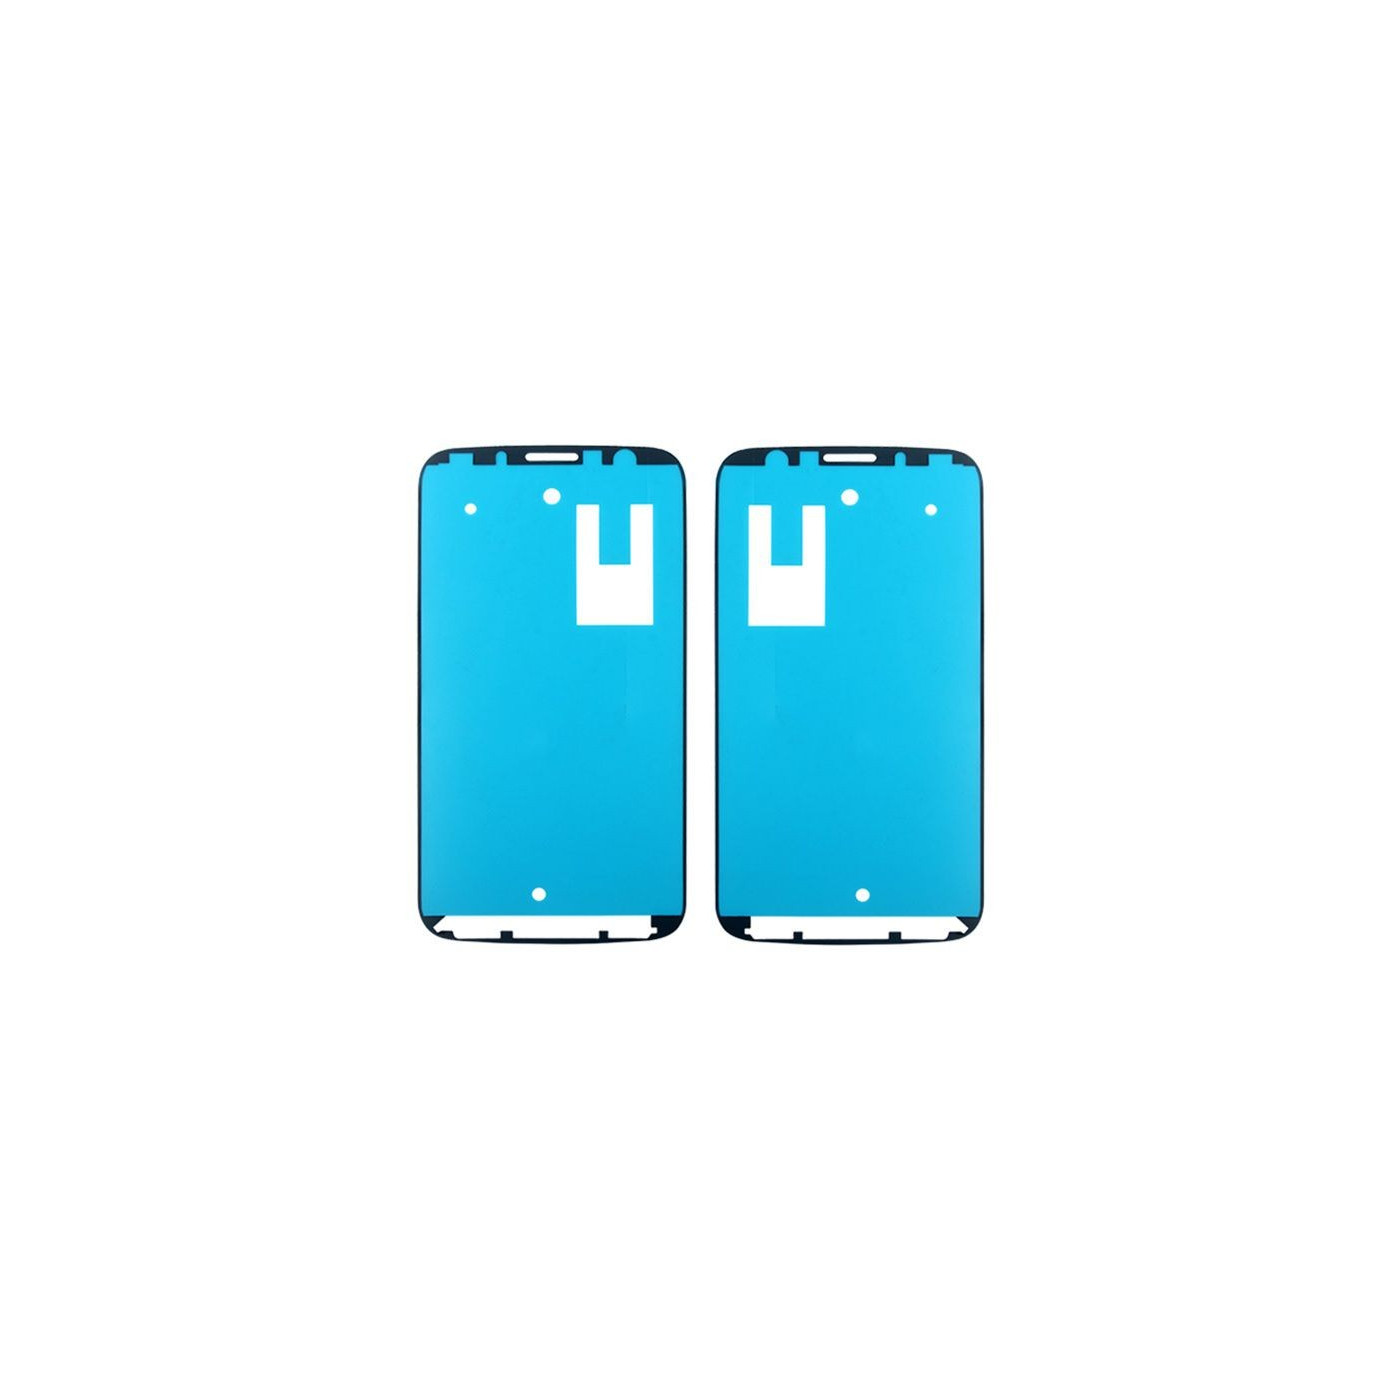 Doppelseitiger Glaskleber für Galaxy Mega 6.3 GT-I9200